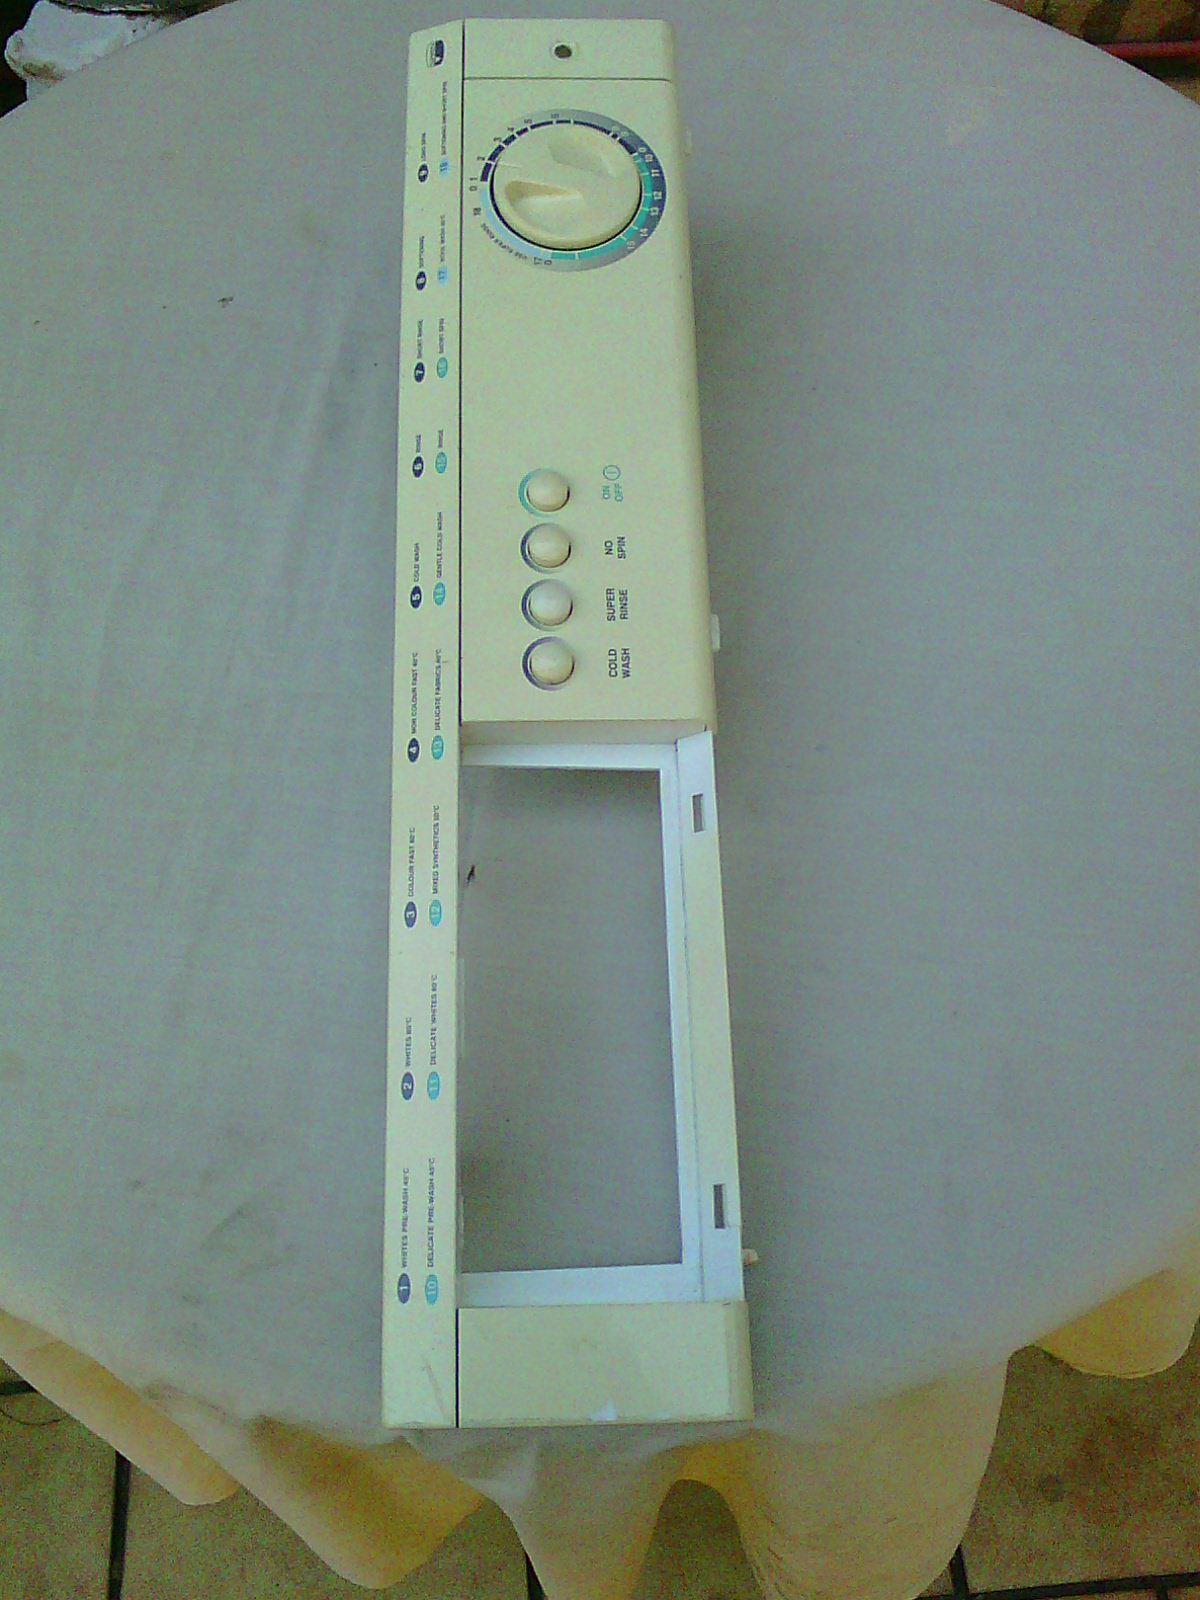 DEFY AUTOMAID automatic washing machine control panel